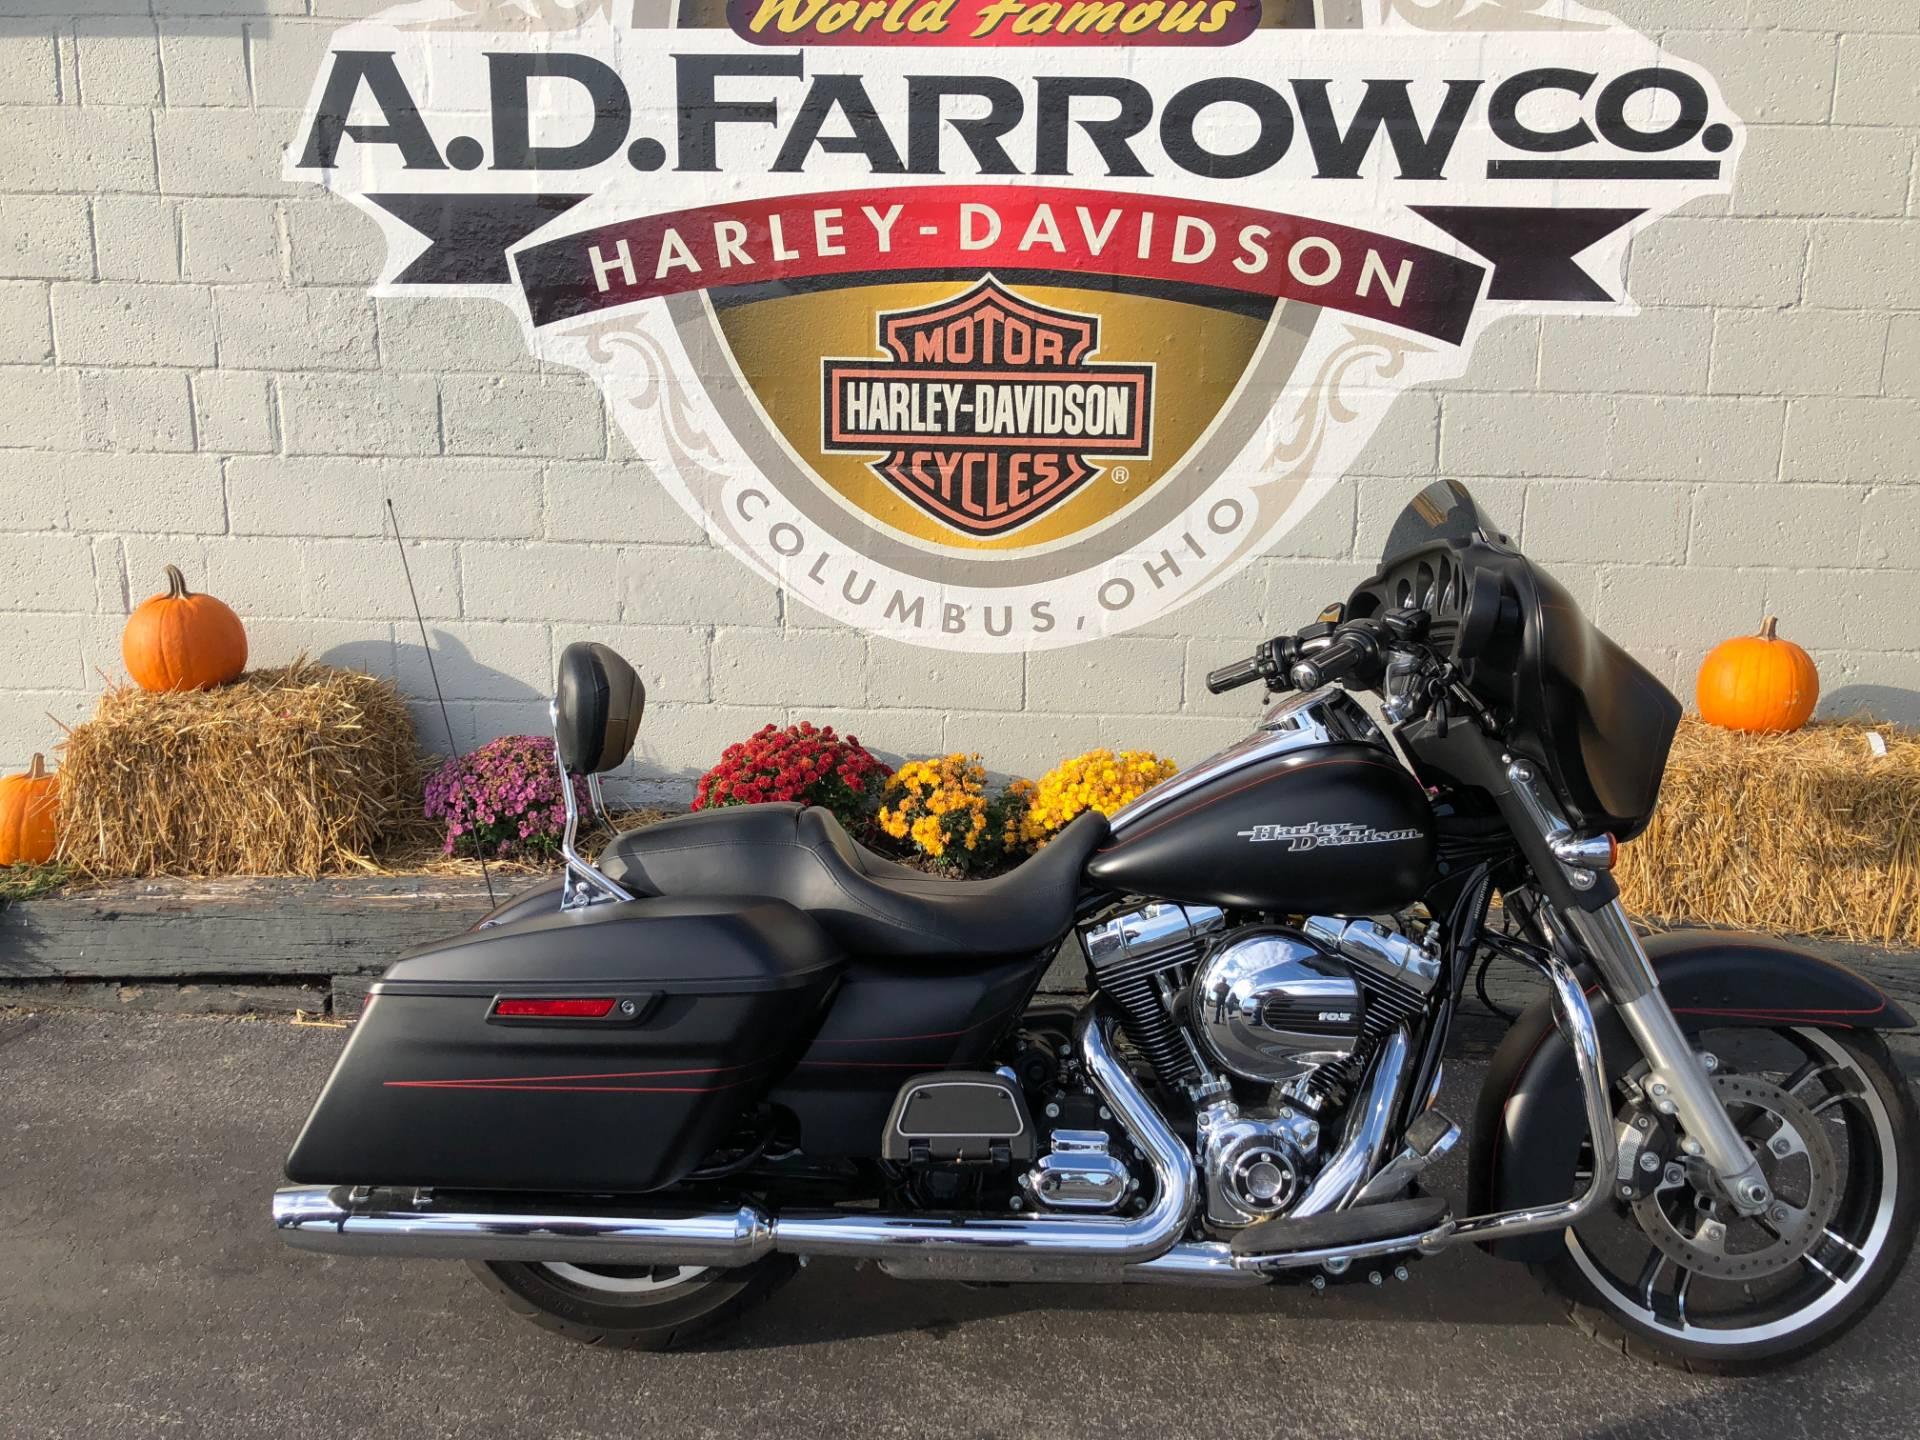 2015 Harley-Davidson Street Glide® Special in Sunbury, Ohio